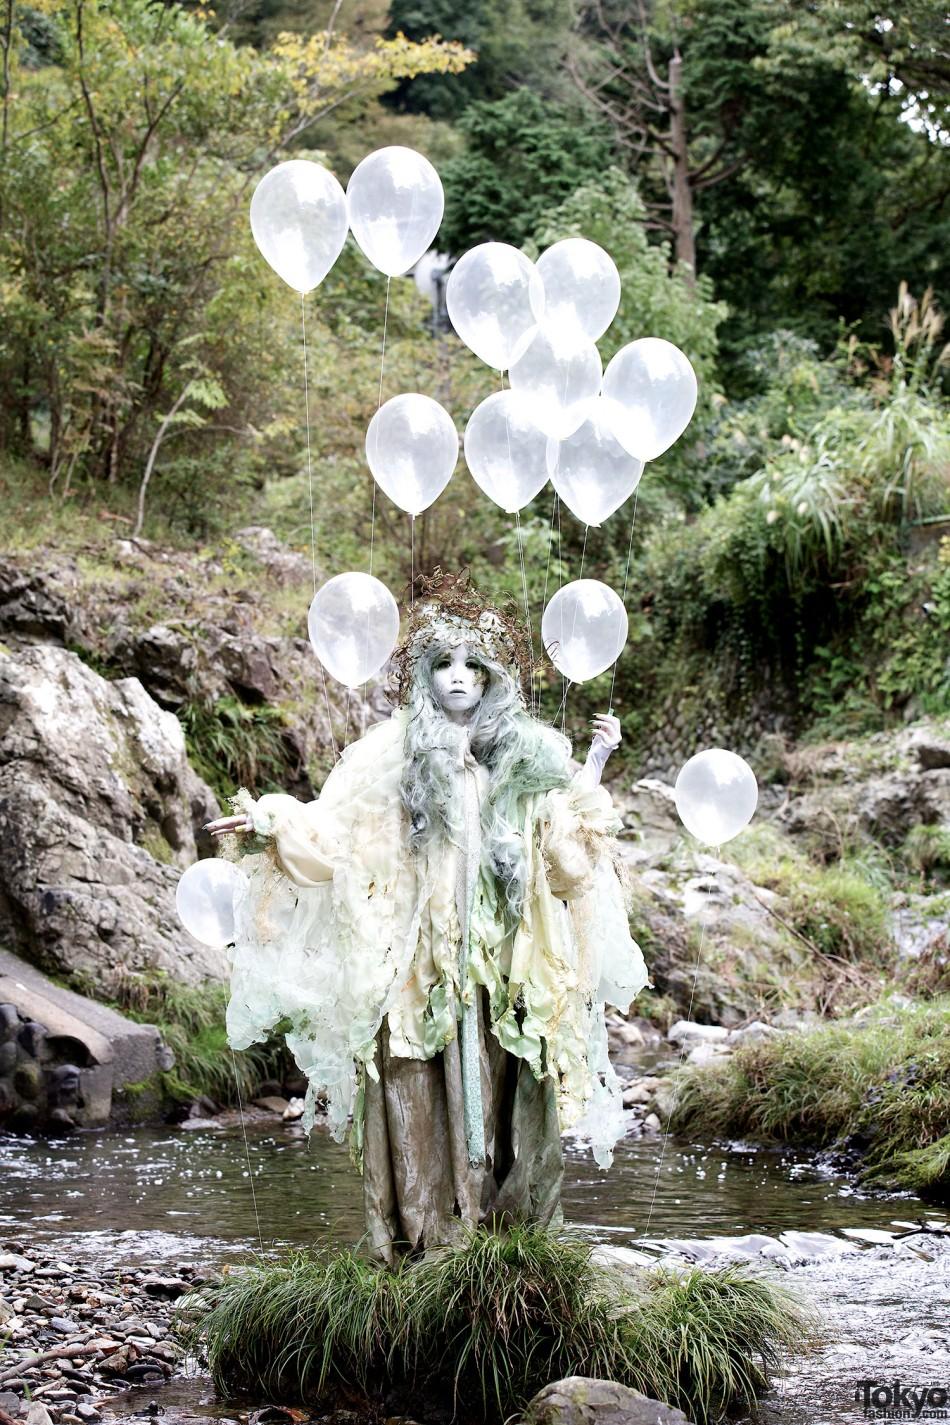 Minori - Her Memories of a Dream (30)